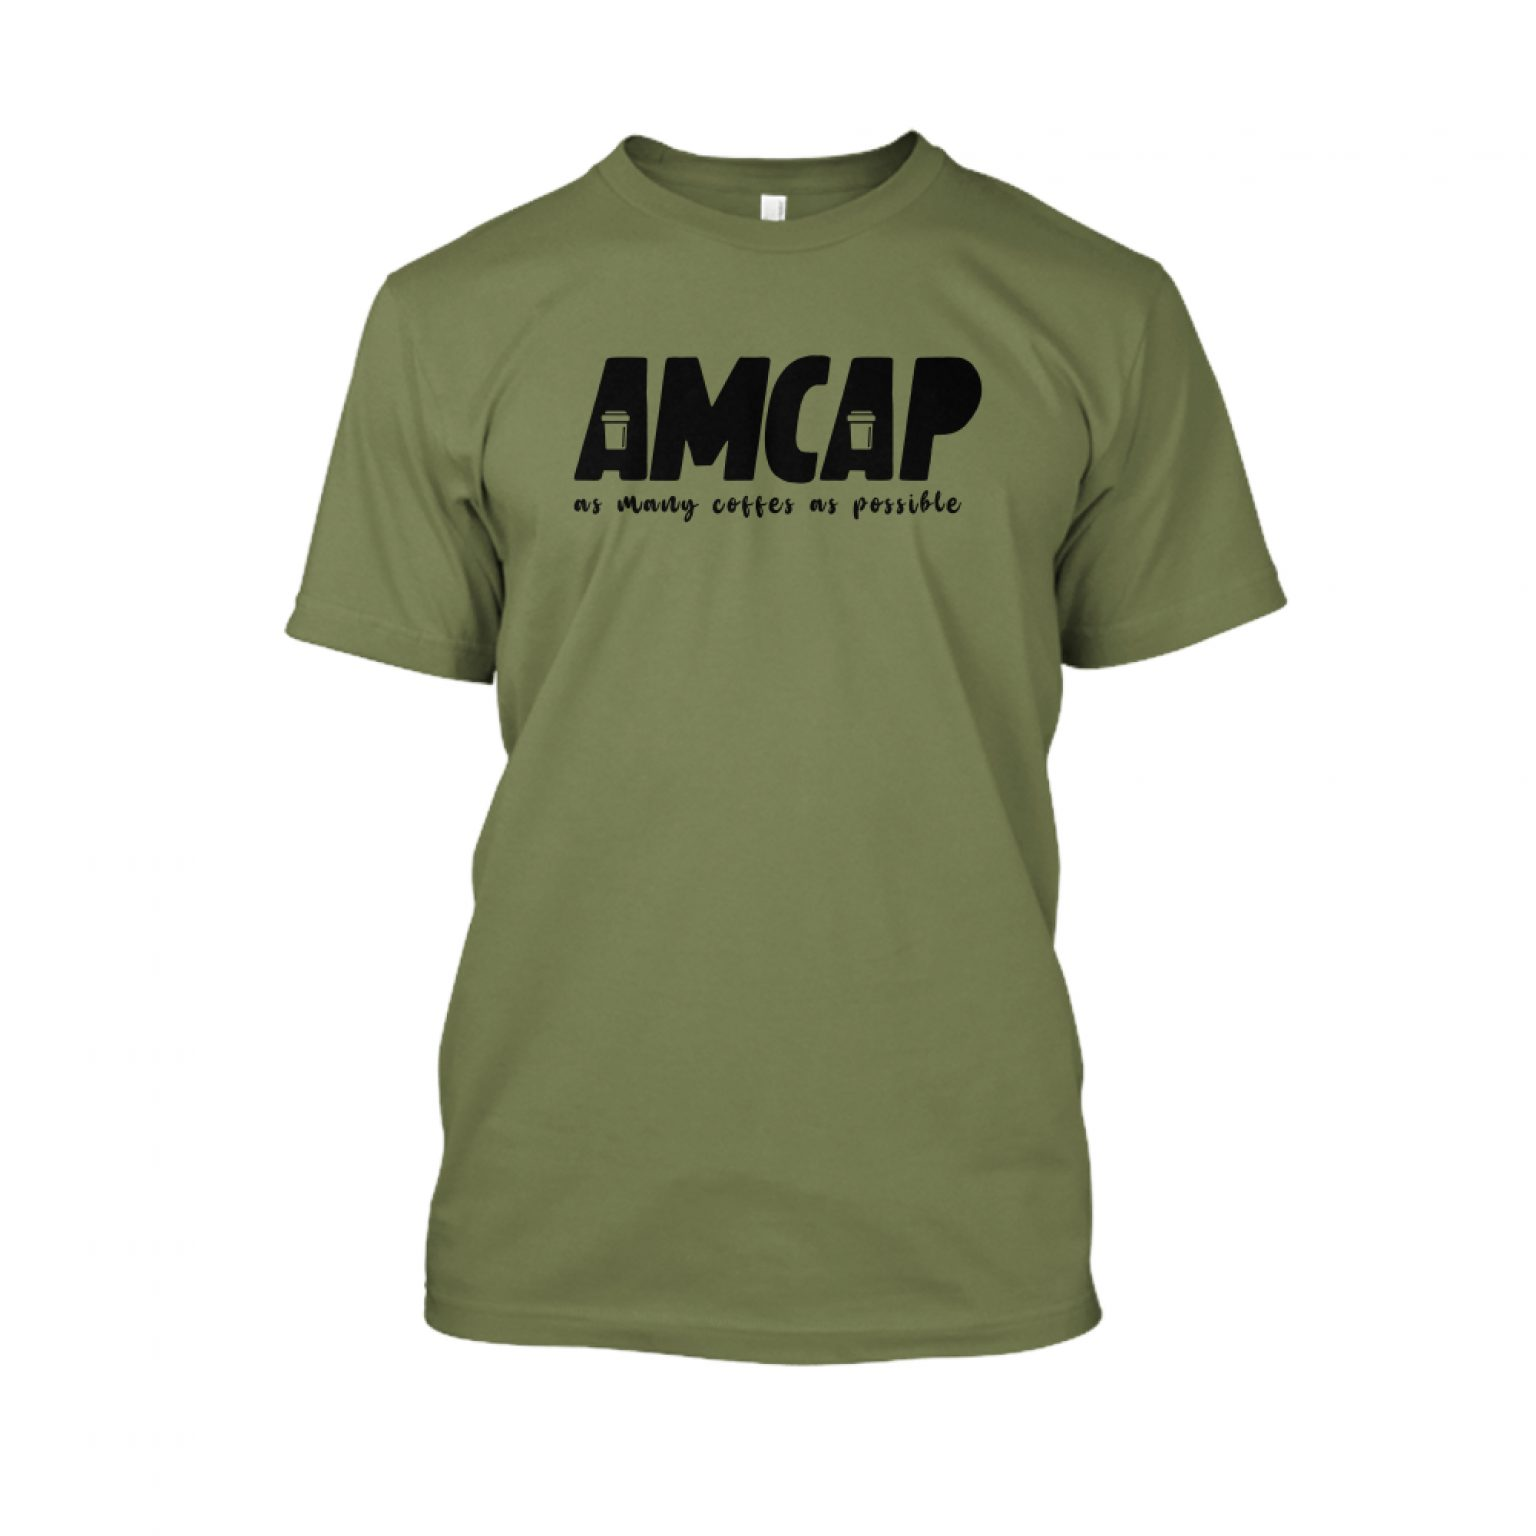 amcap Herren Shirt military front